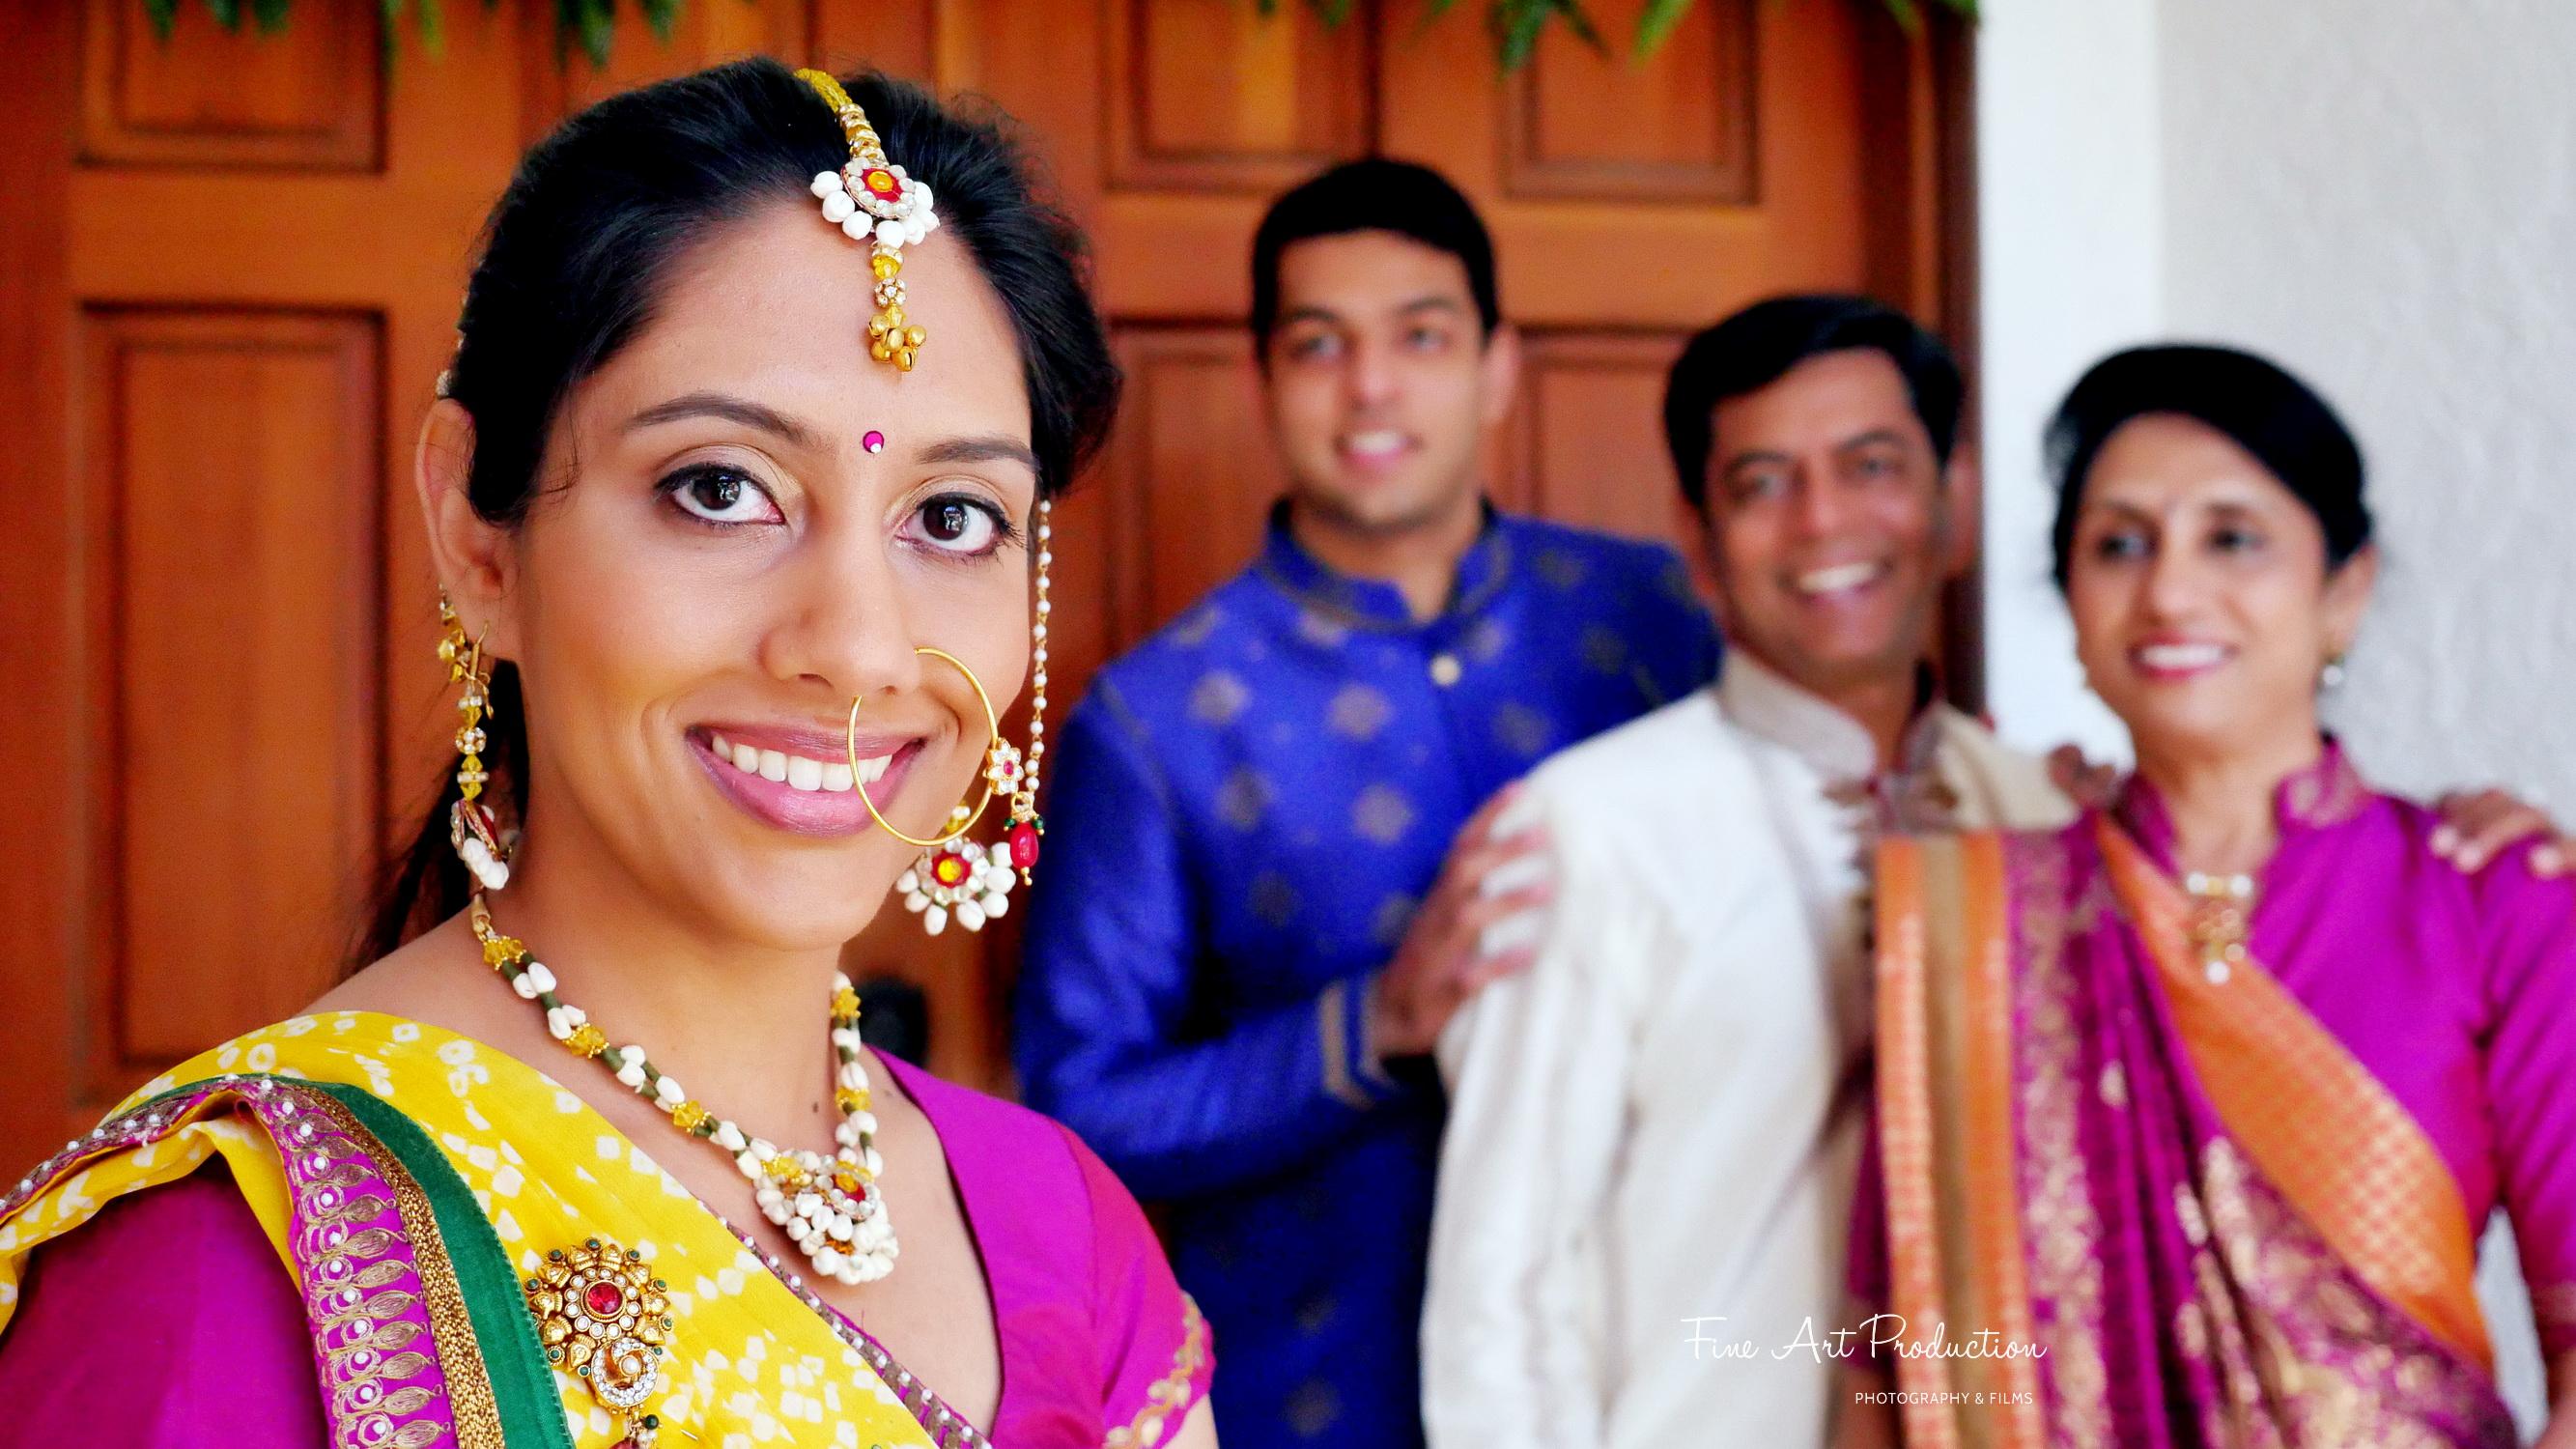 india-wedding-photographer-fine-art-production-chirali-amish-thakkar_0148